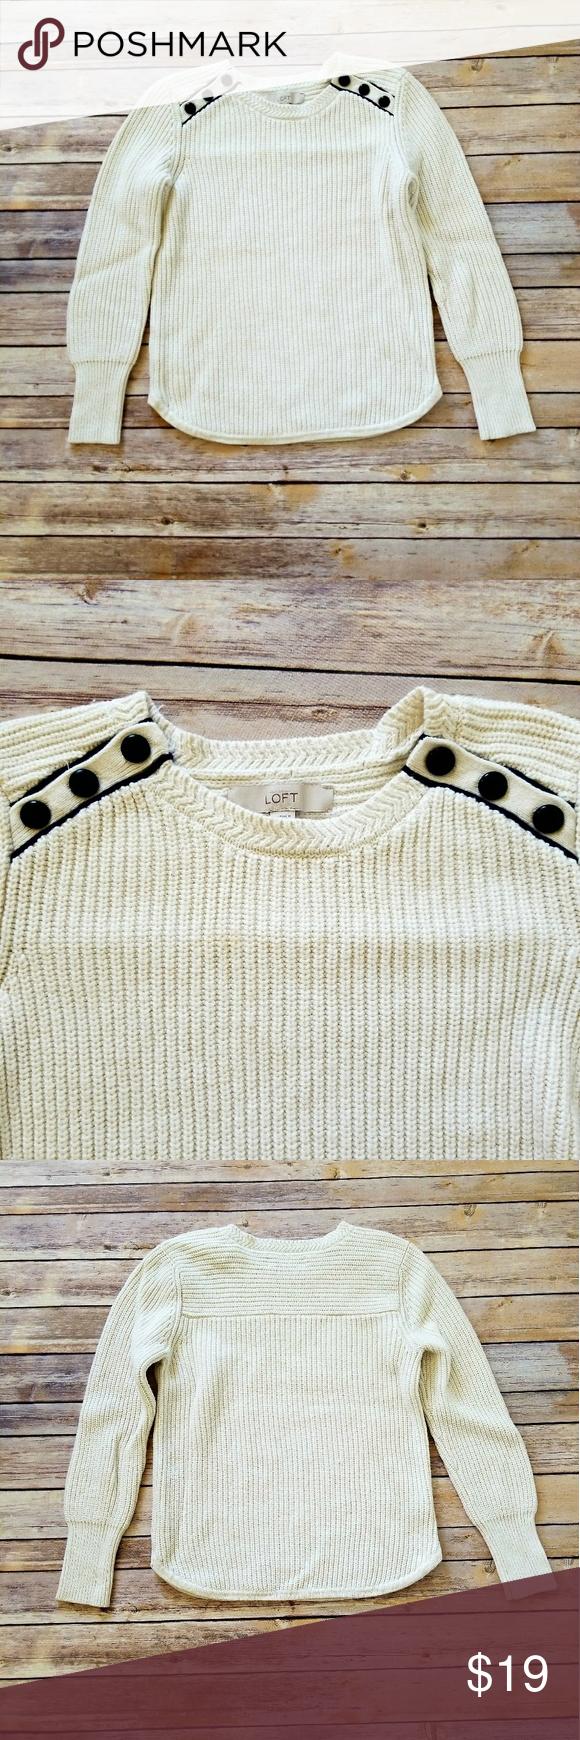 LOFT Cream Color Knit Sweater | Lofts, Scoop neck and Shoulder